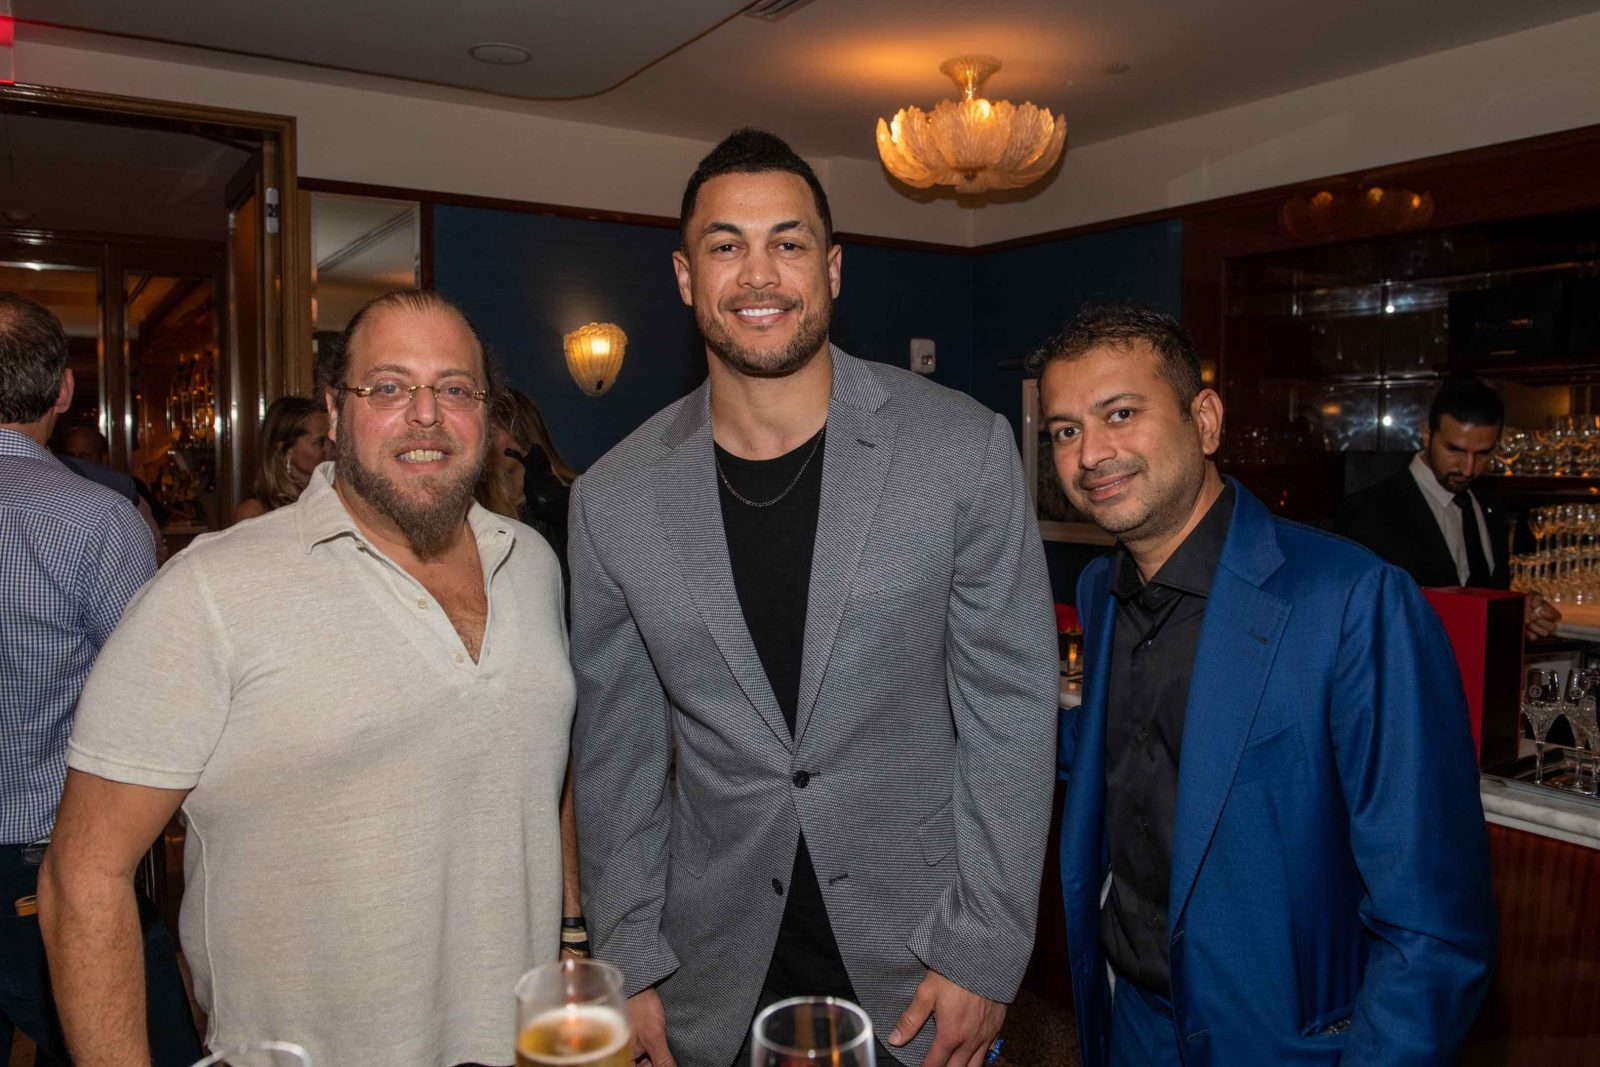 Gil Dezer, Giancarlo Stanton and Kamal Hotchandani